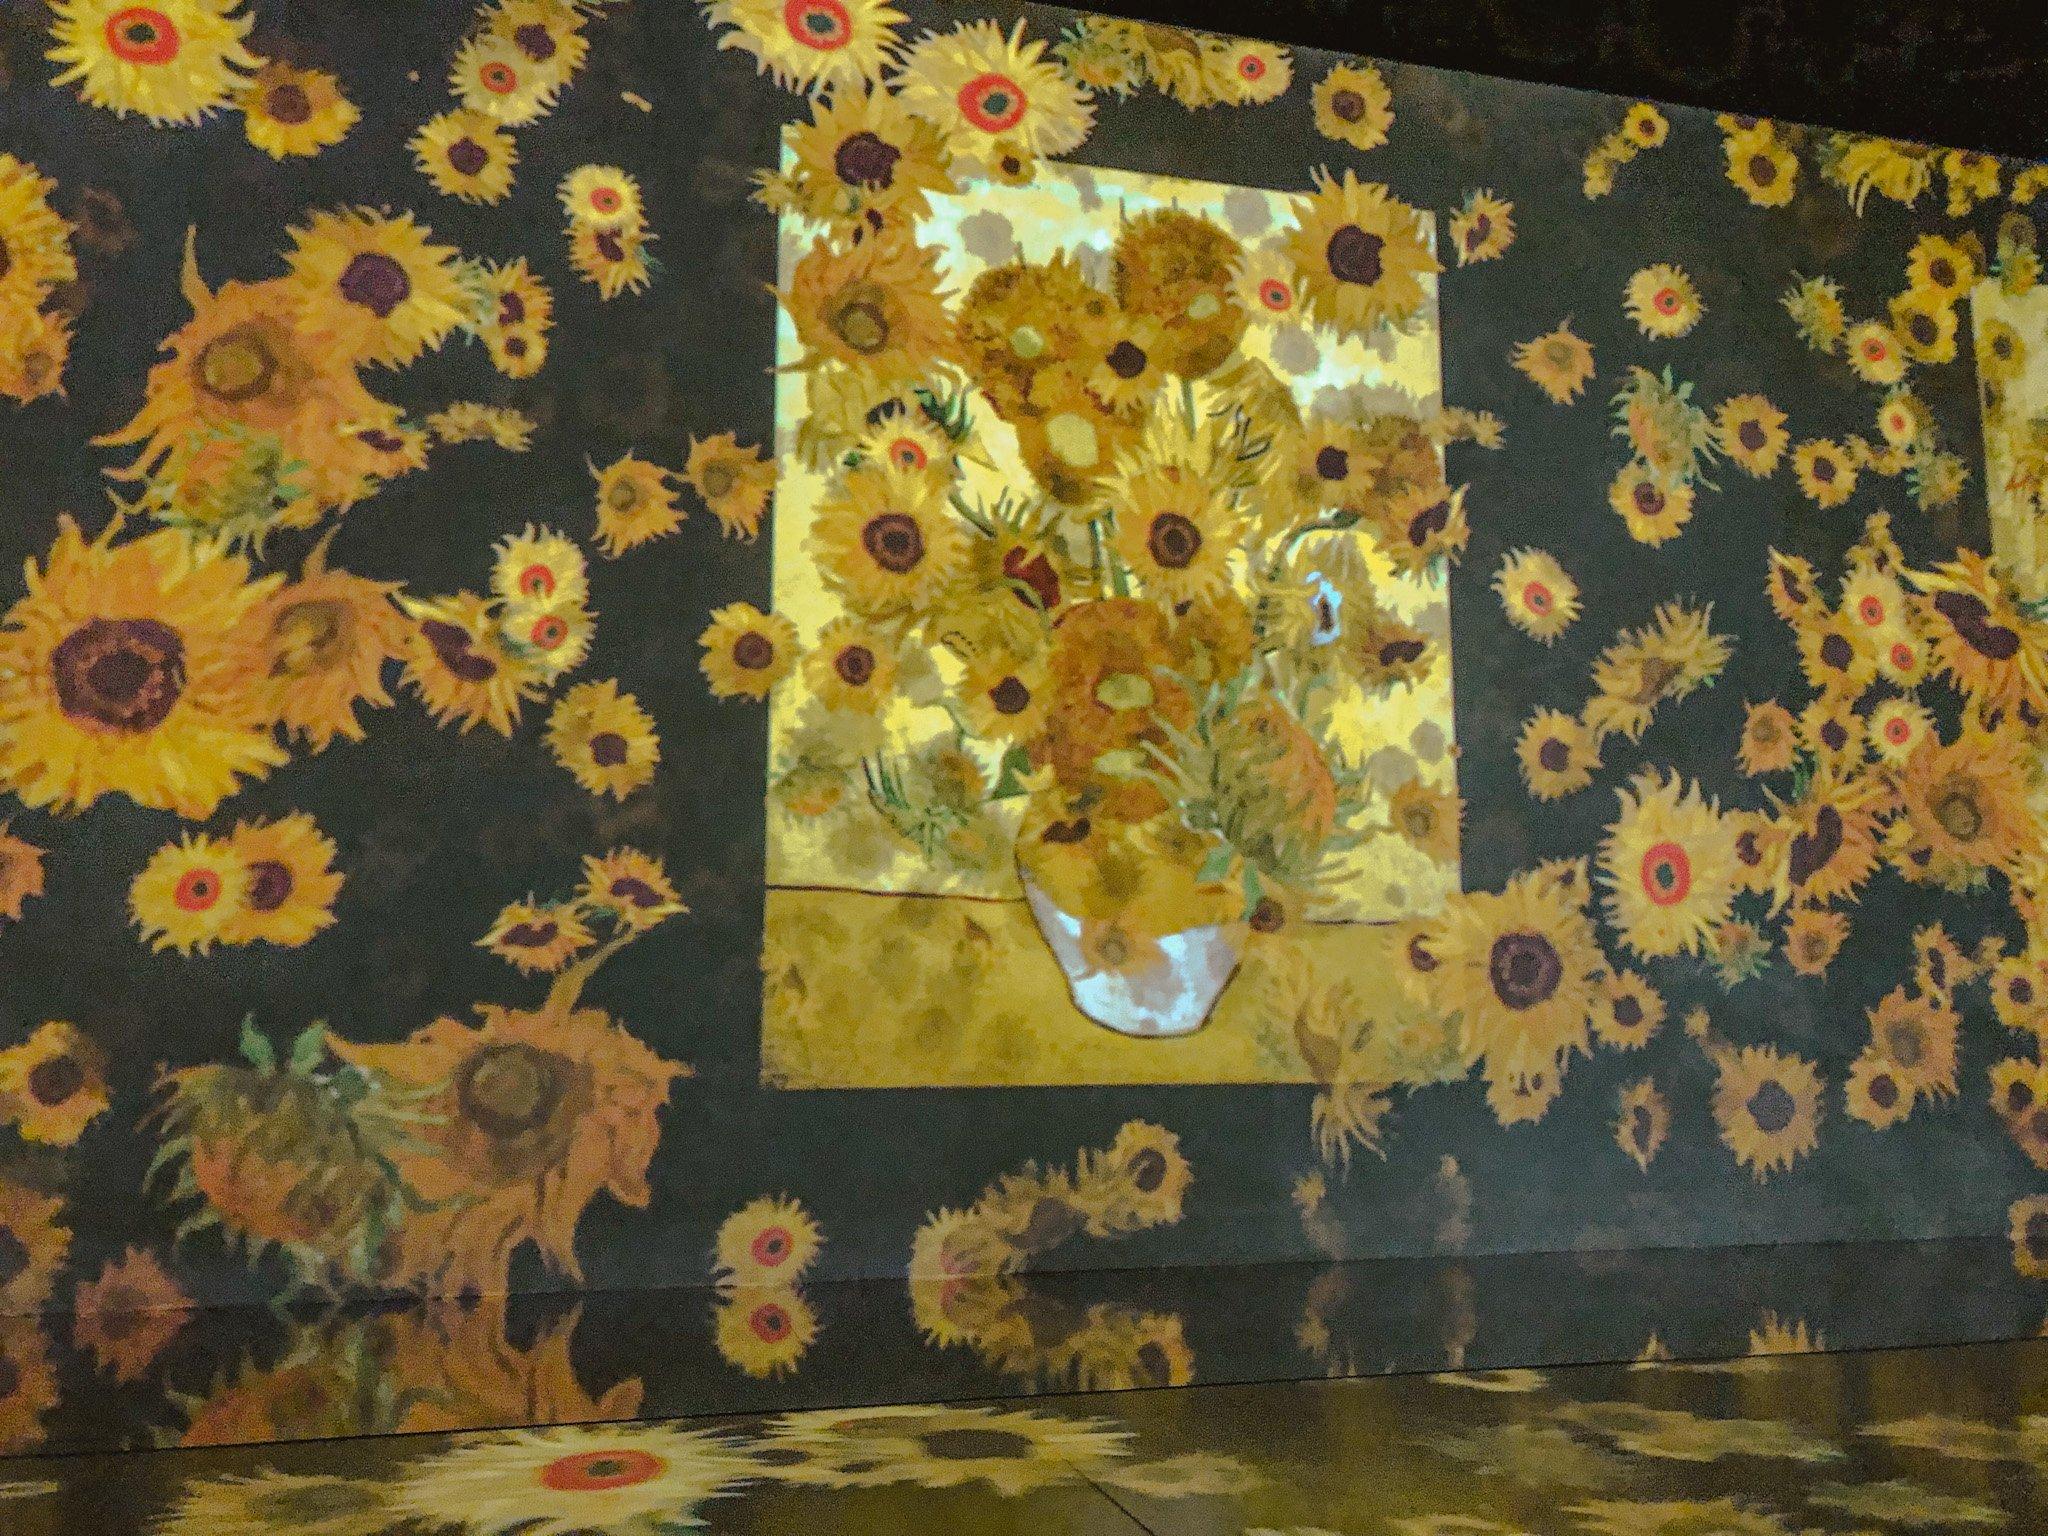 girasoli Van Gogh mostra immersa